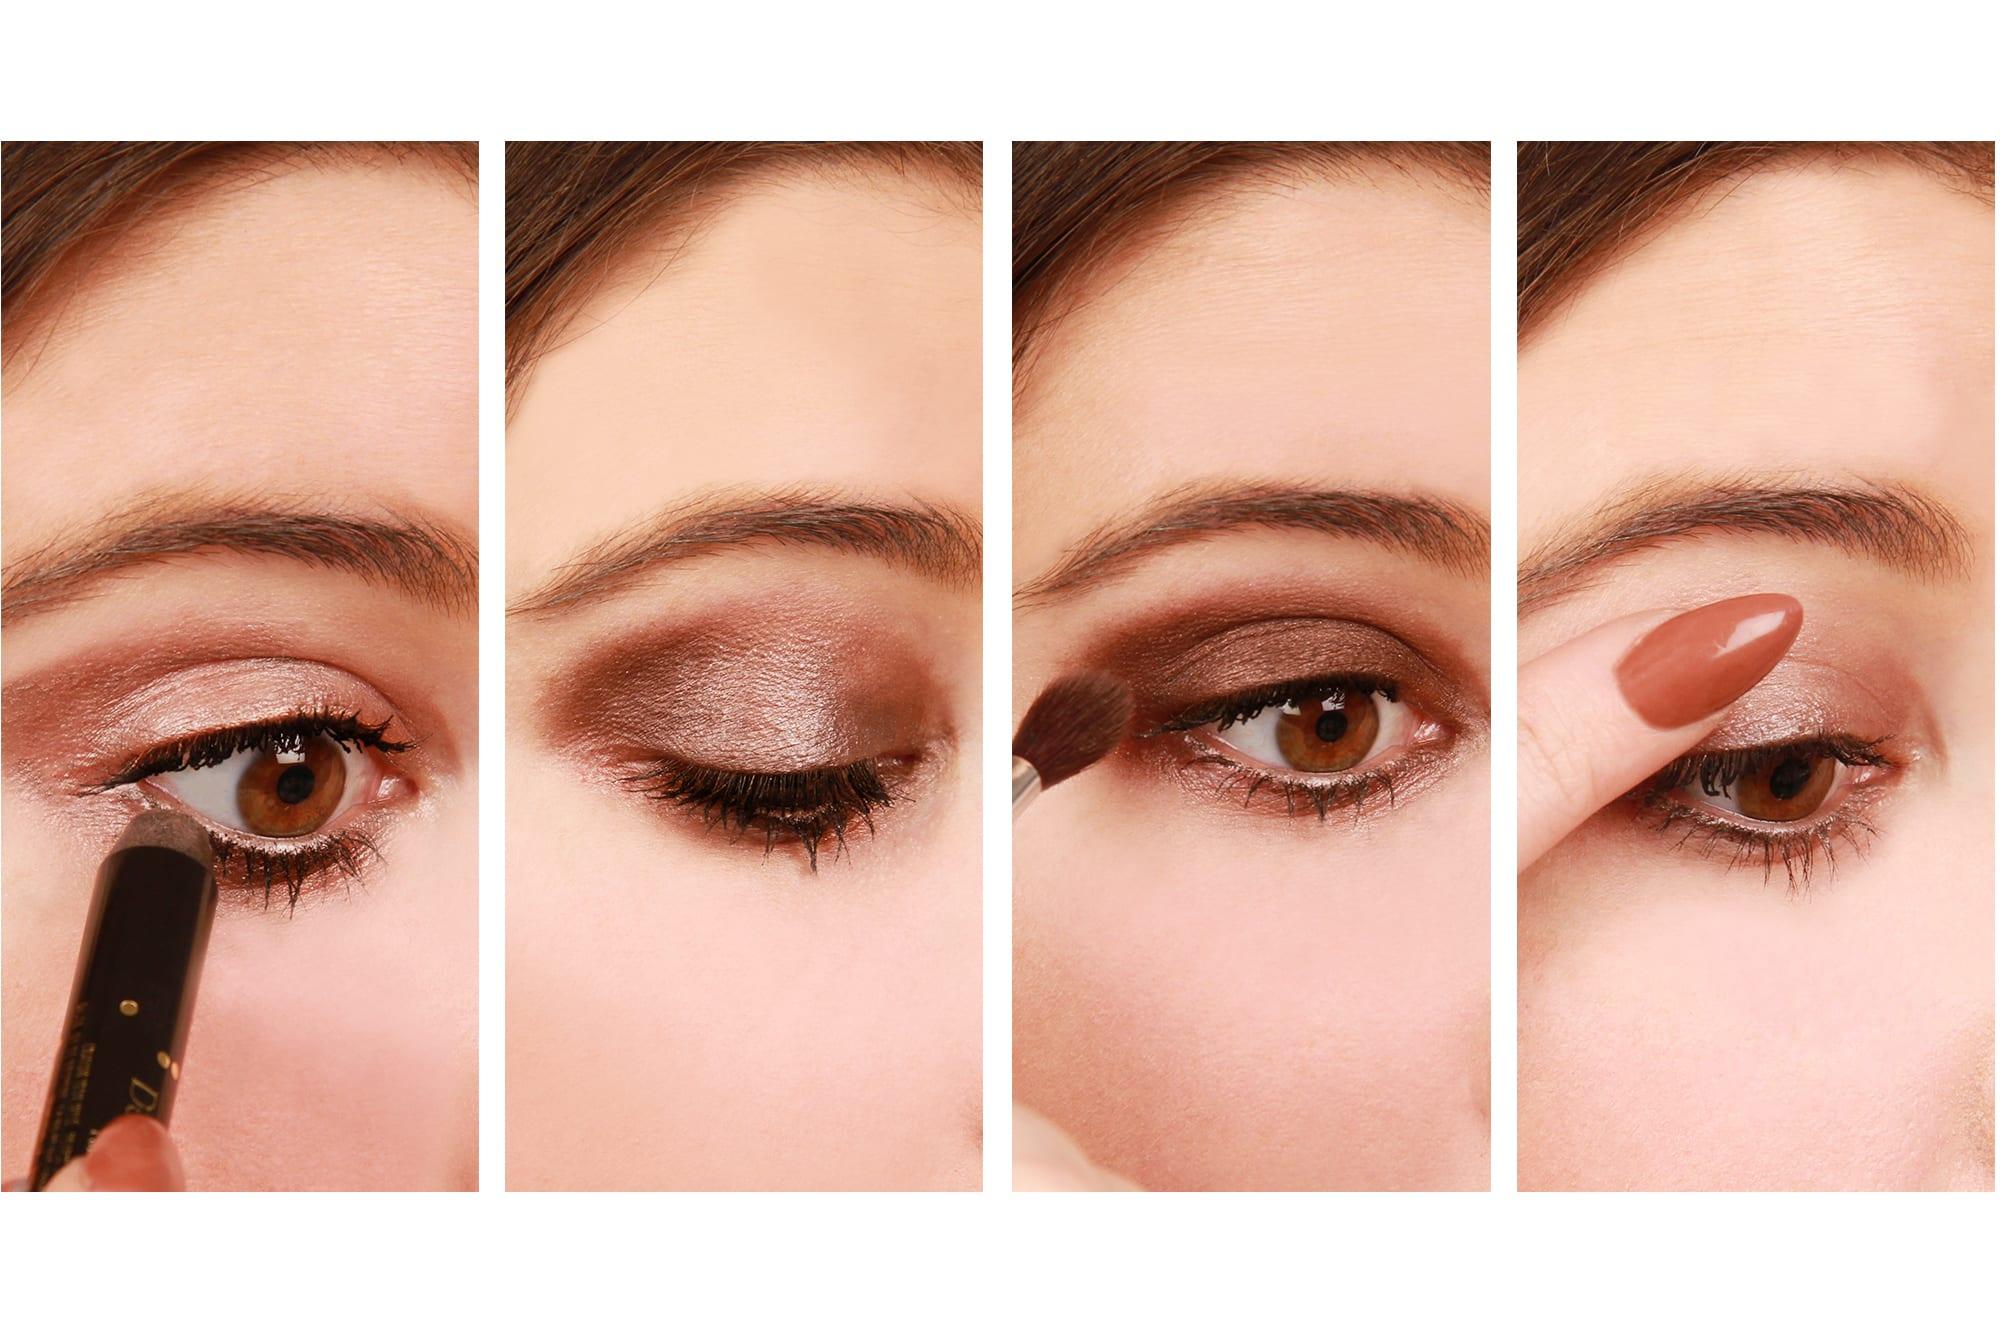 Beauty School: Four Ways To Use A Chubby Eye Pencil